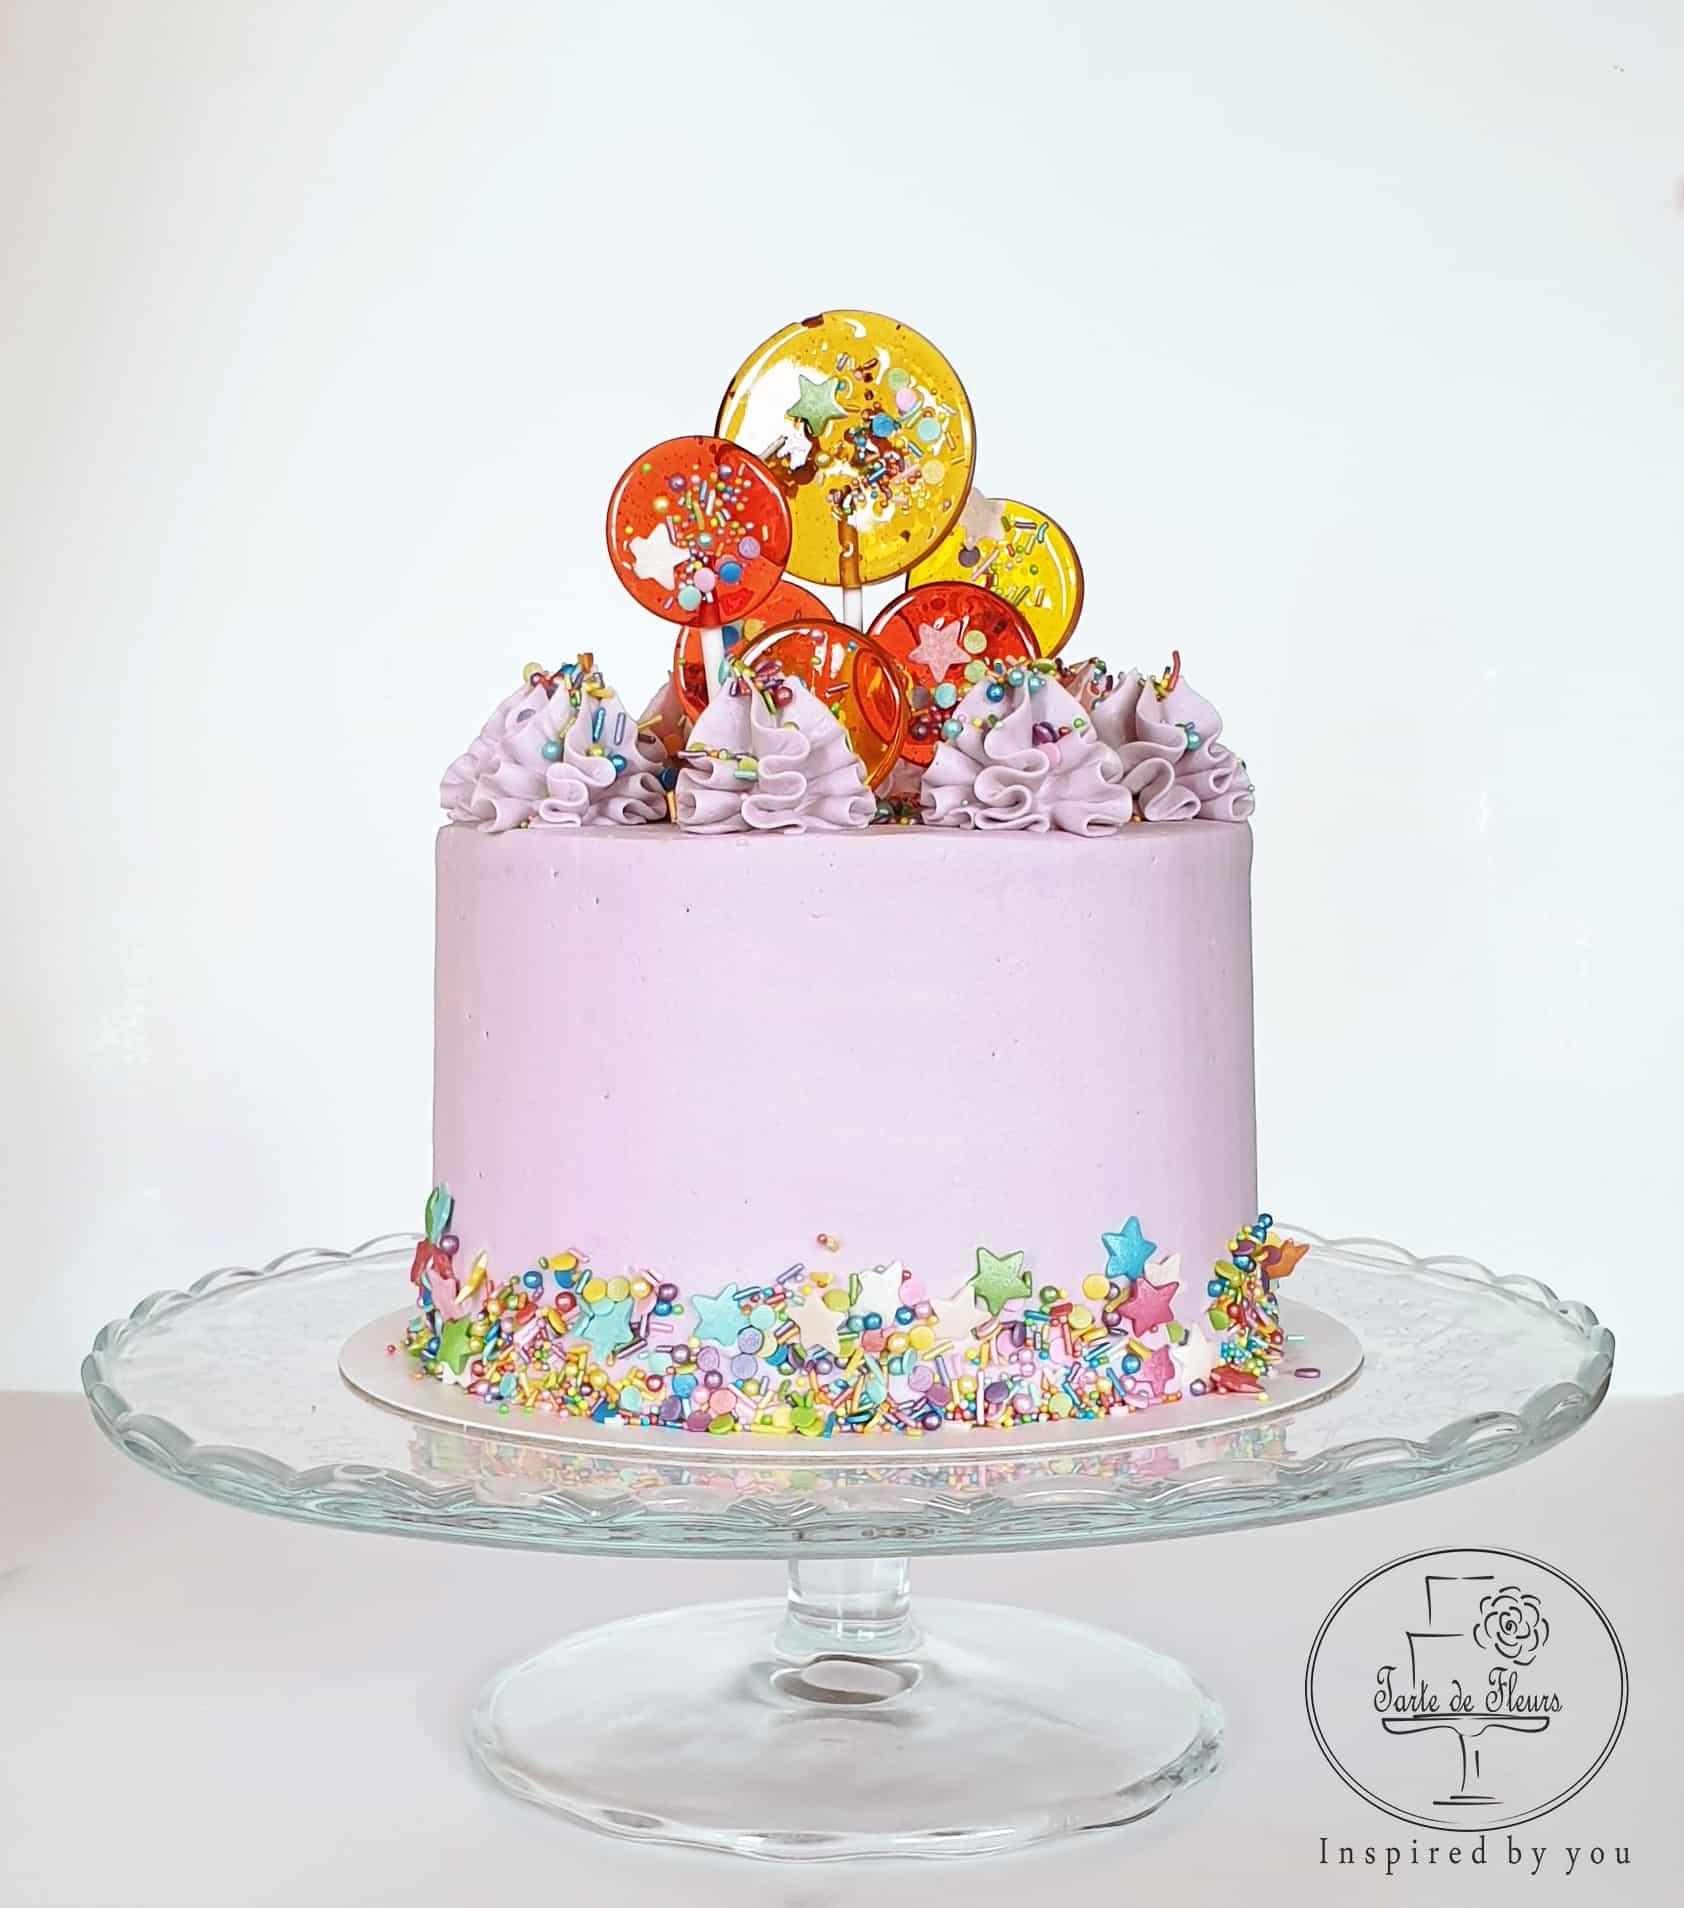 Marvelous Sprinkles Birthday Cake Order Online Tarte De Fleurs Harlow Birthday Cards Printable Inklcafe Filternl